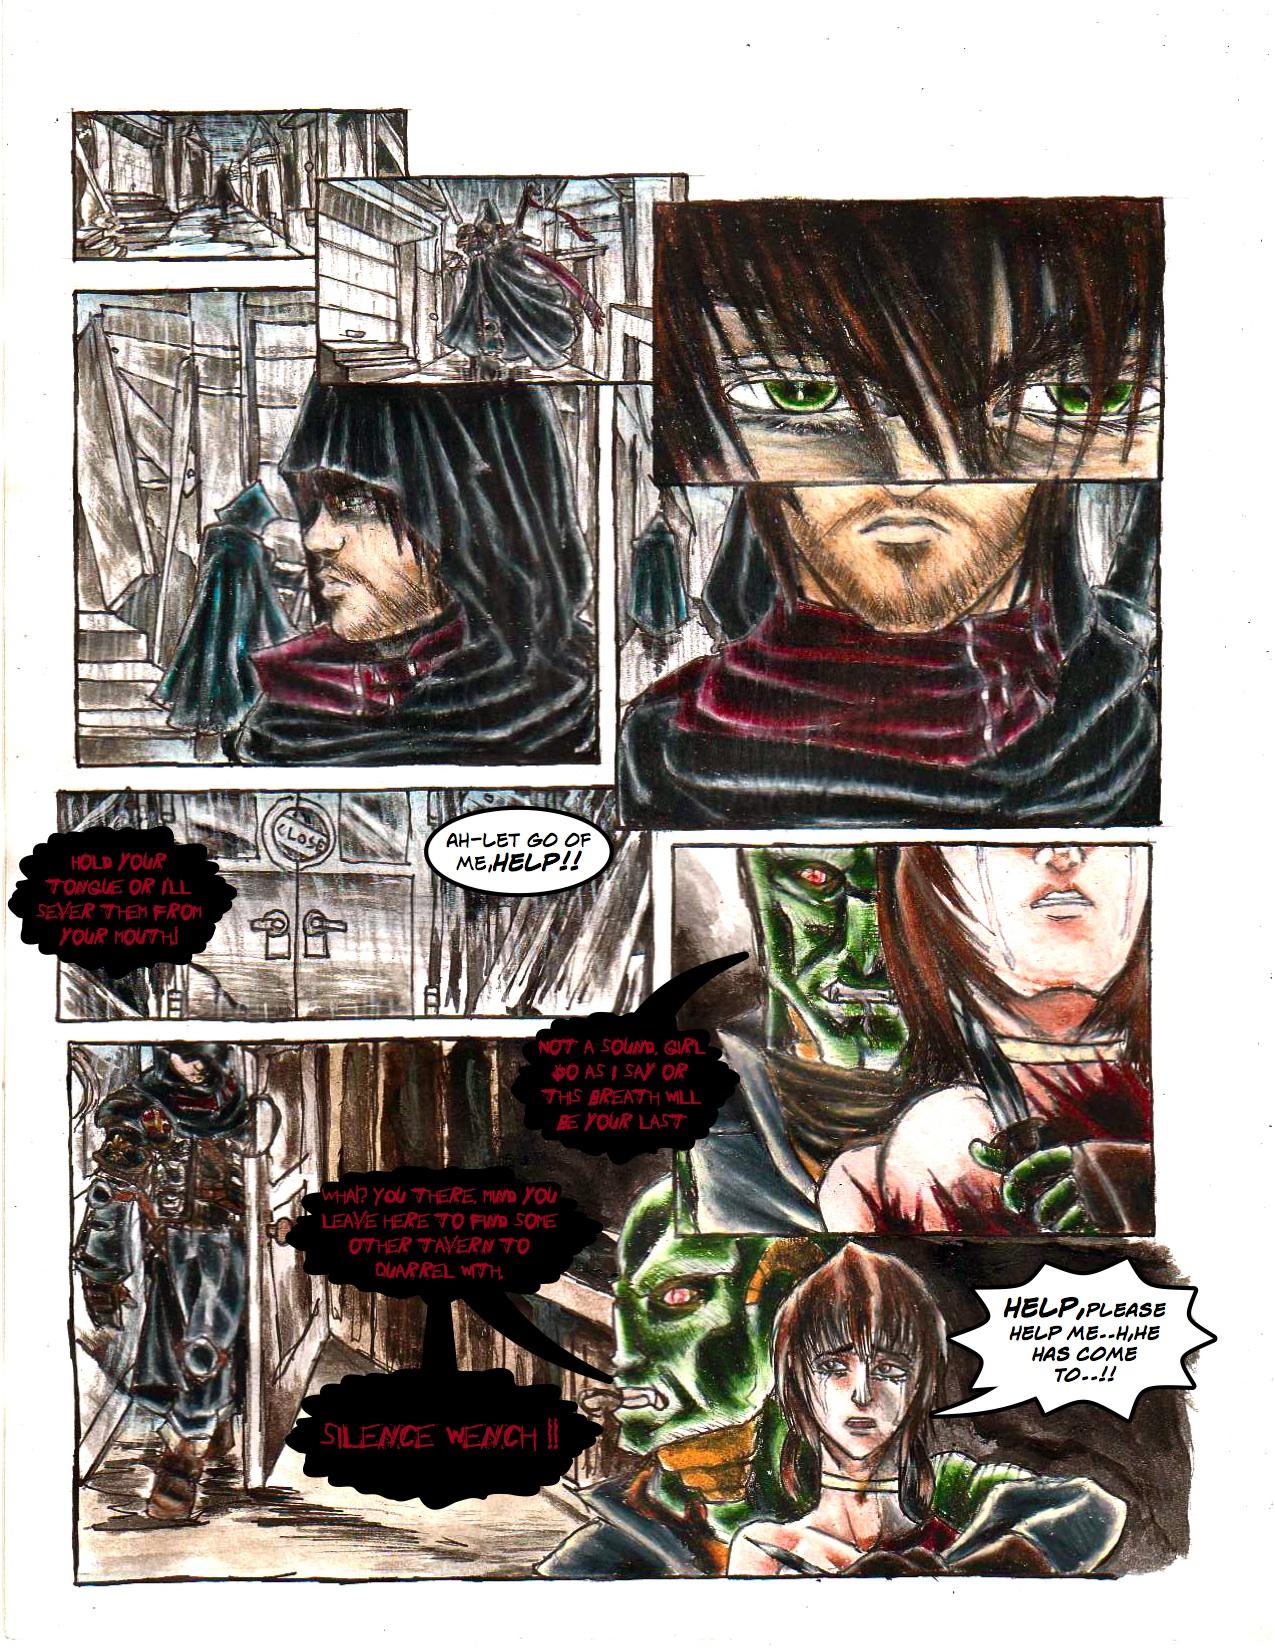 Myth page 2